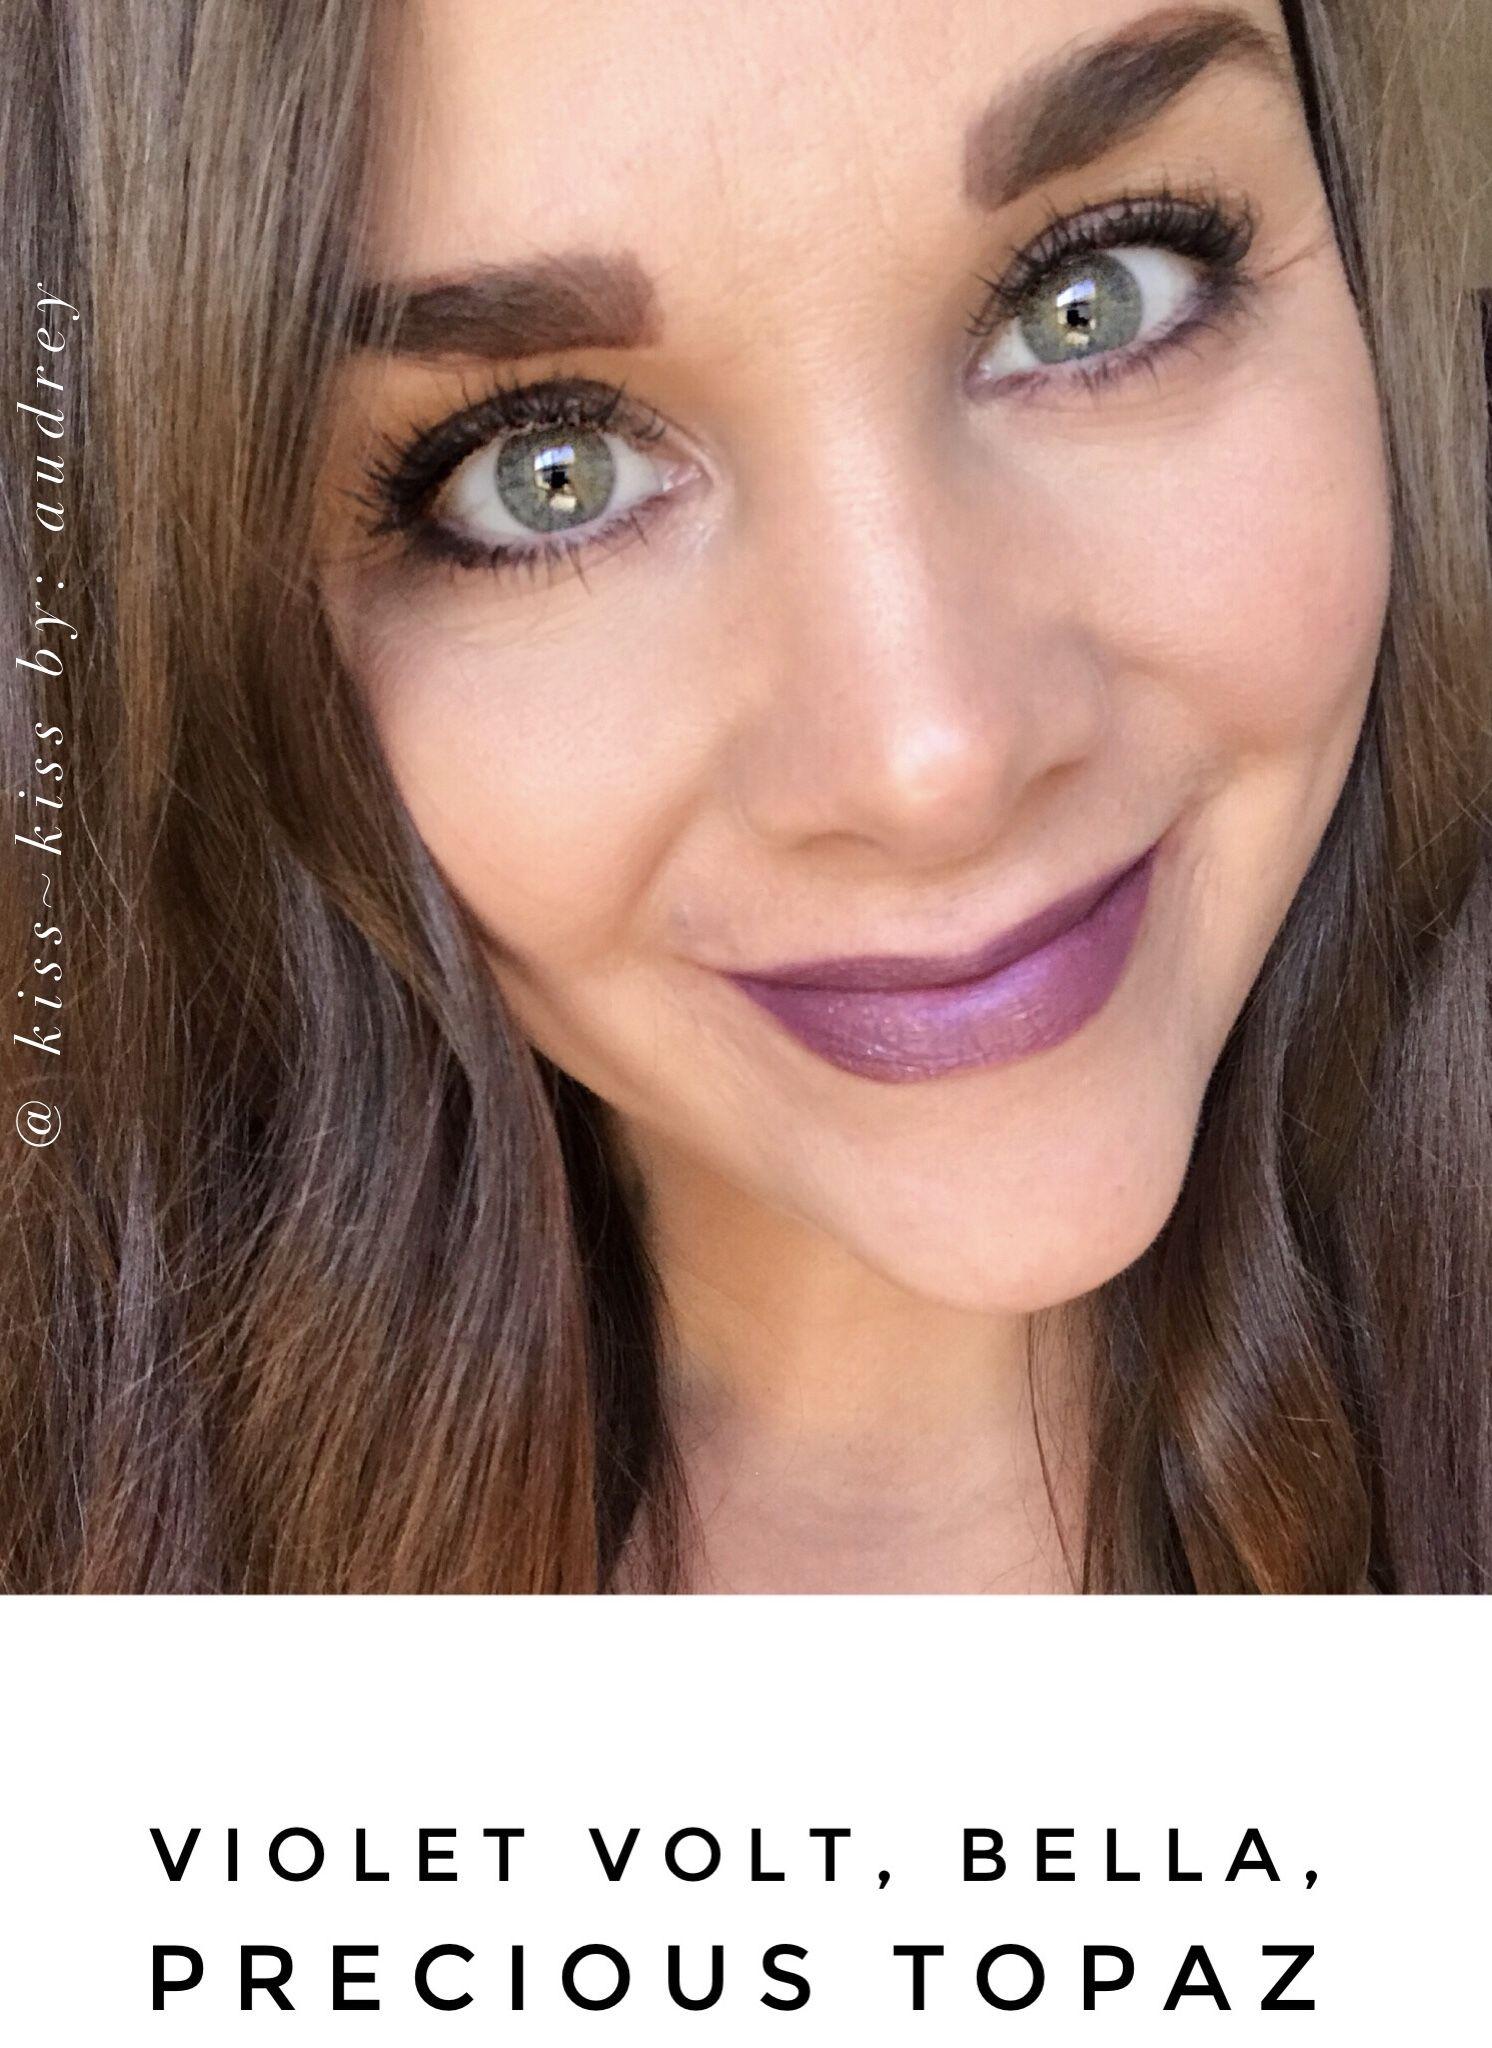 Lipsense Violet Volt Bella Precious Topaz Pre Mixed Topped With Jill Beauty Lip Matte 13 Purplish Plum Gloss